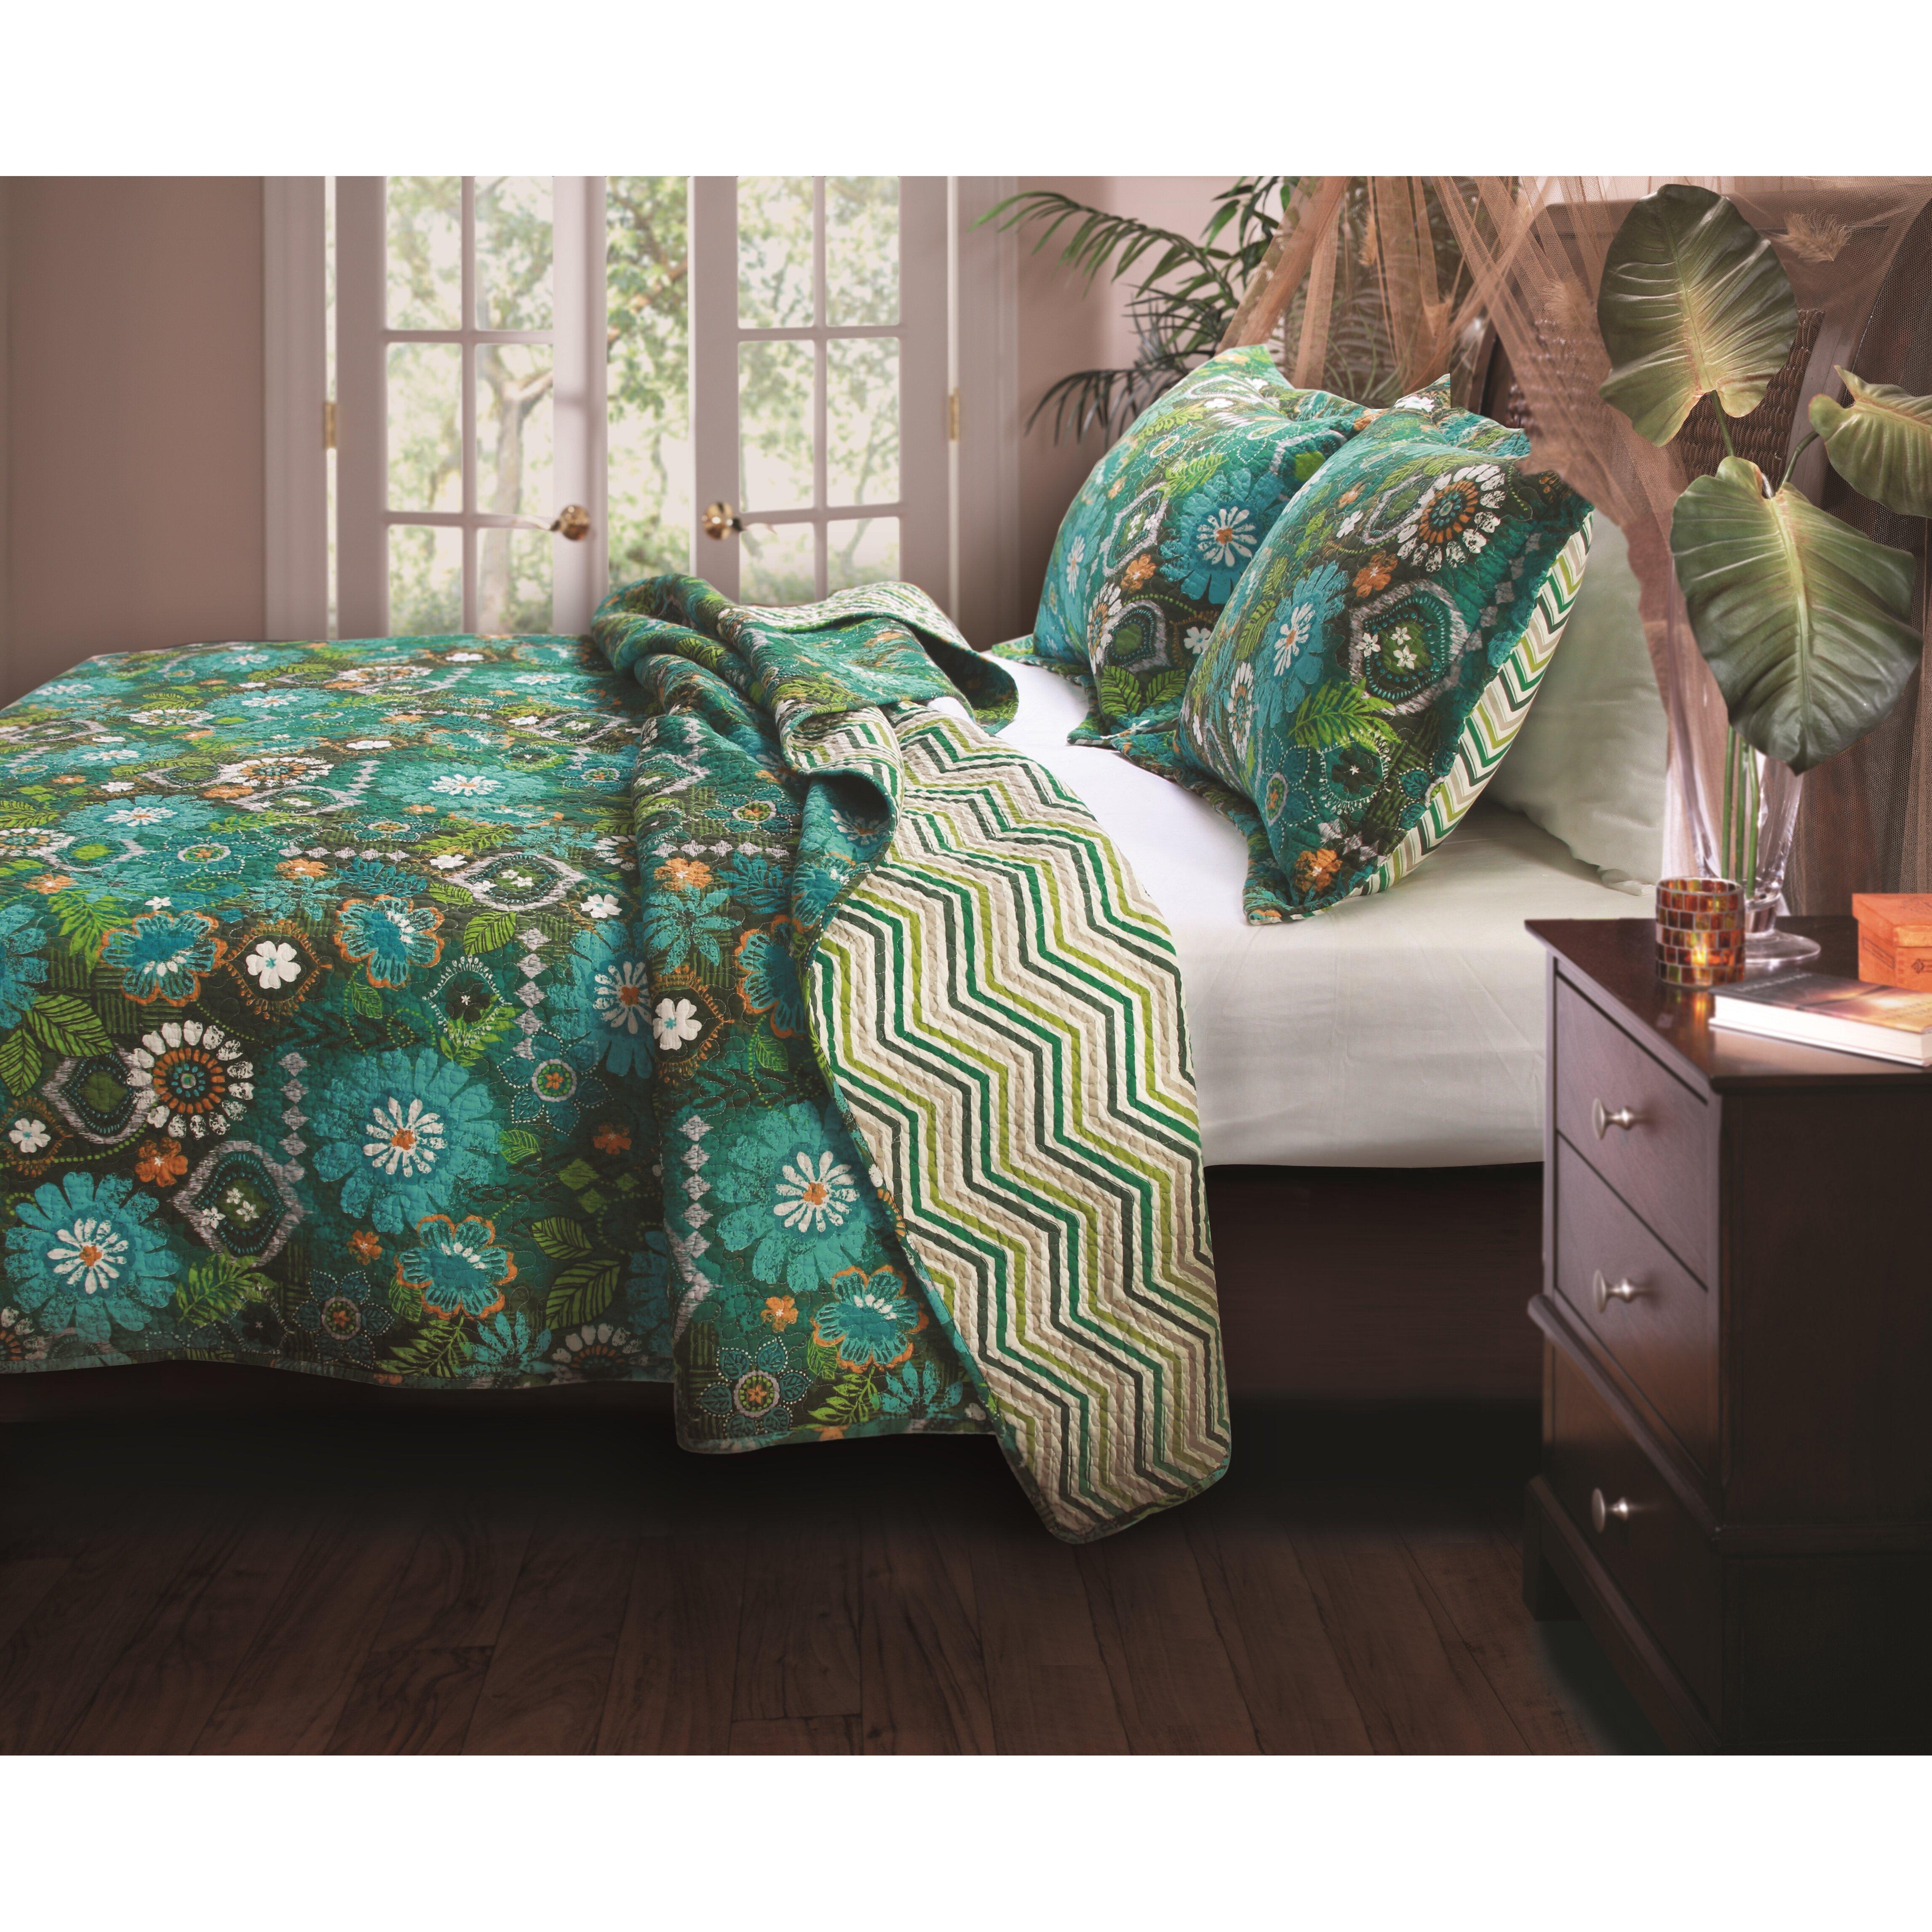 Inspiration Photo Tiki Hut: Greenland Home Fashions Tiki Hut Reversible Quilt Set